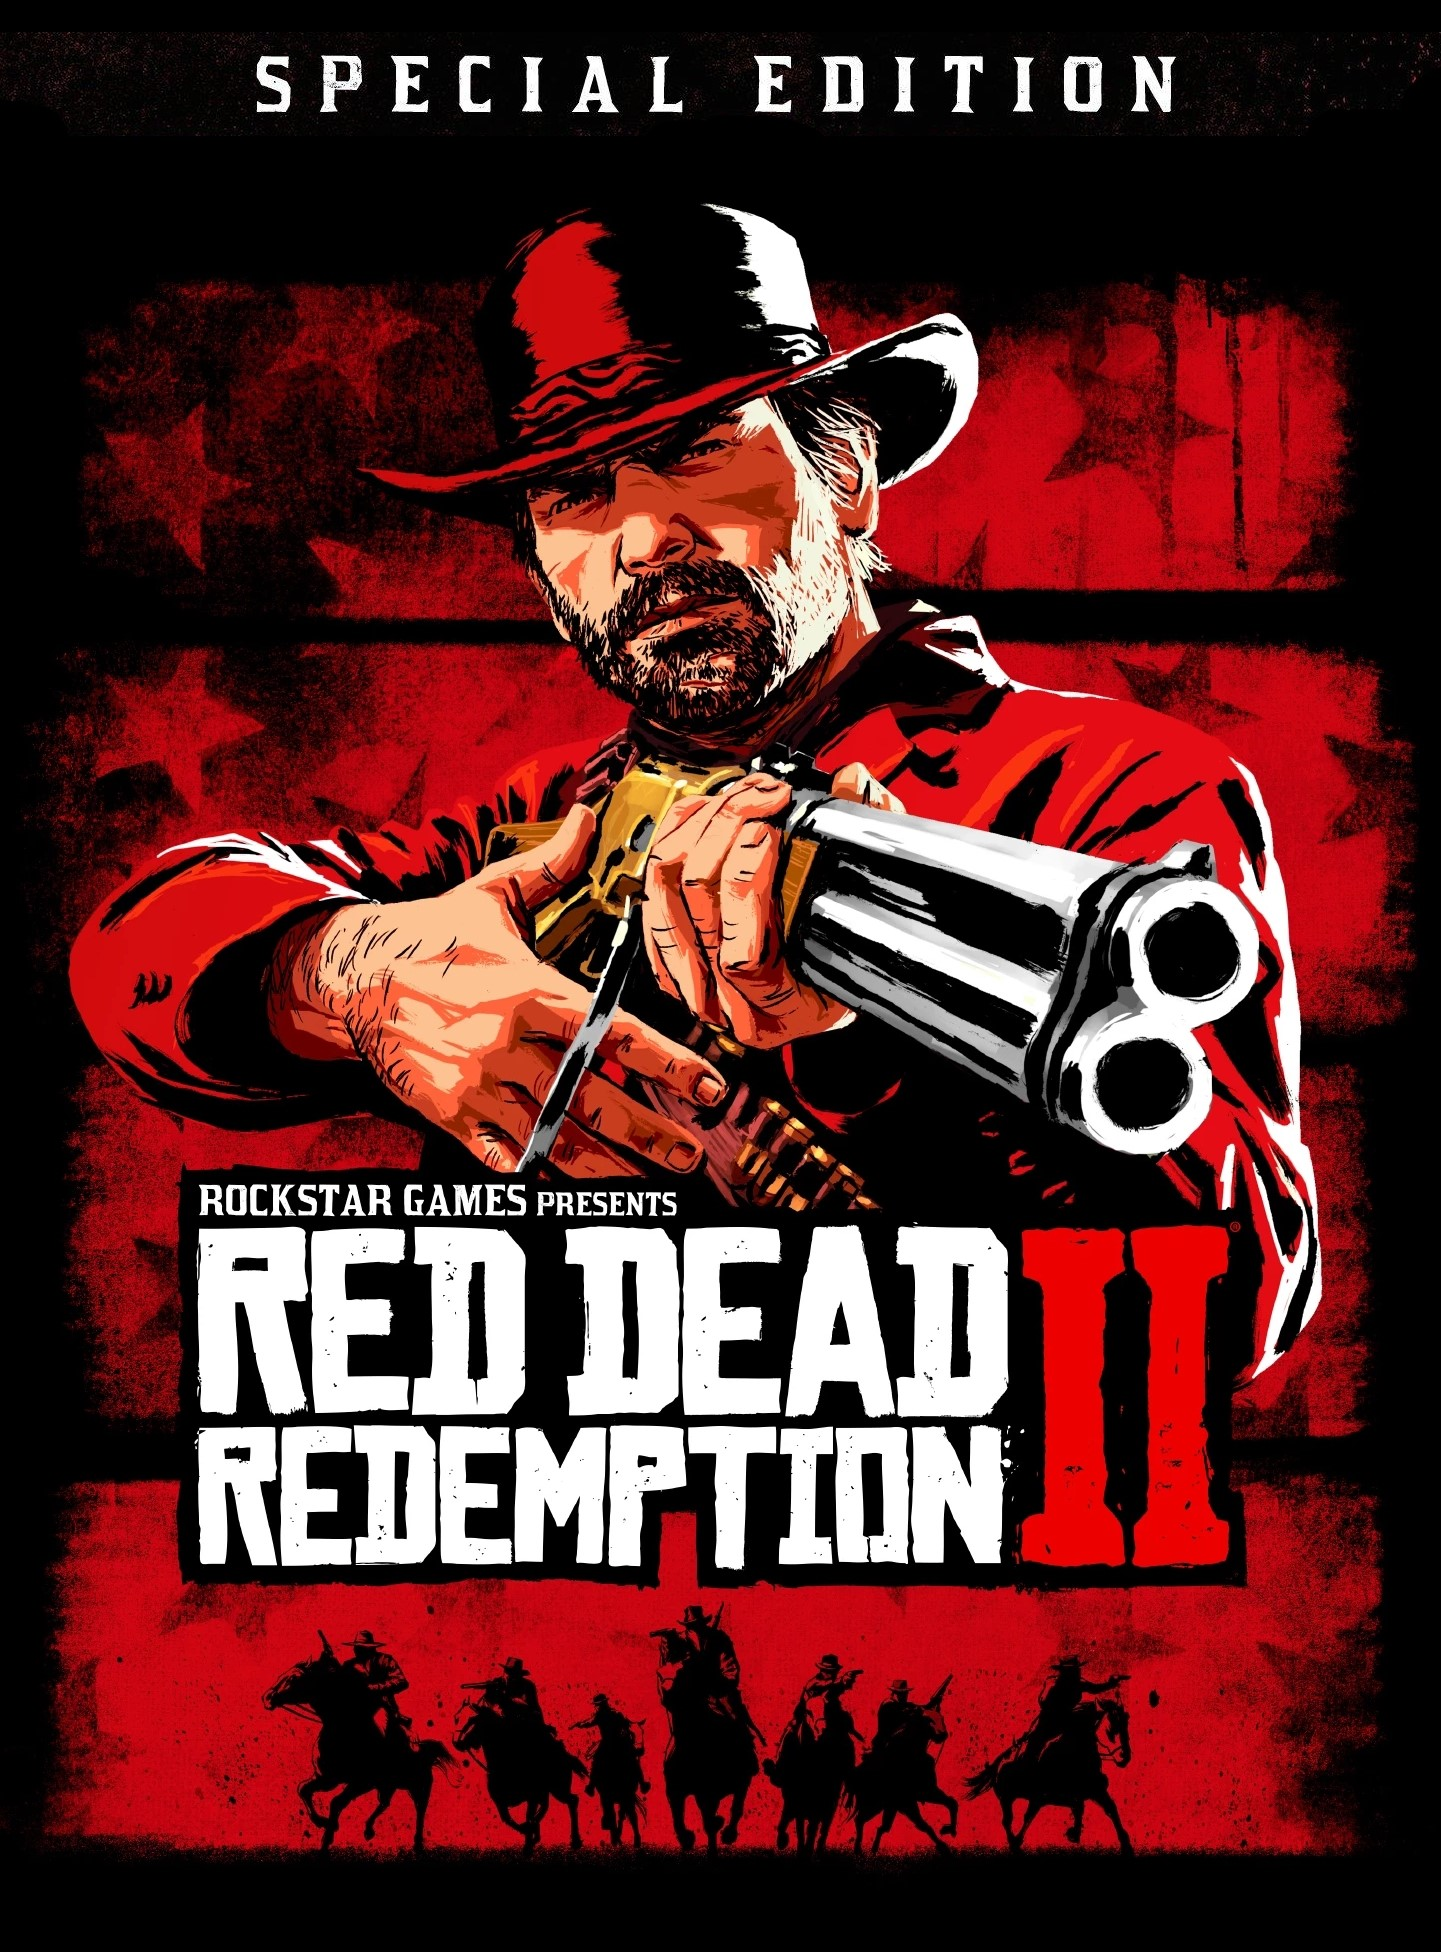 Red Dead Redemption 2: Special Edition (Steam Россия)🔥